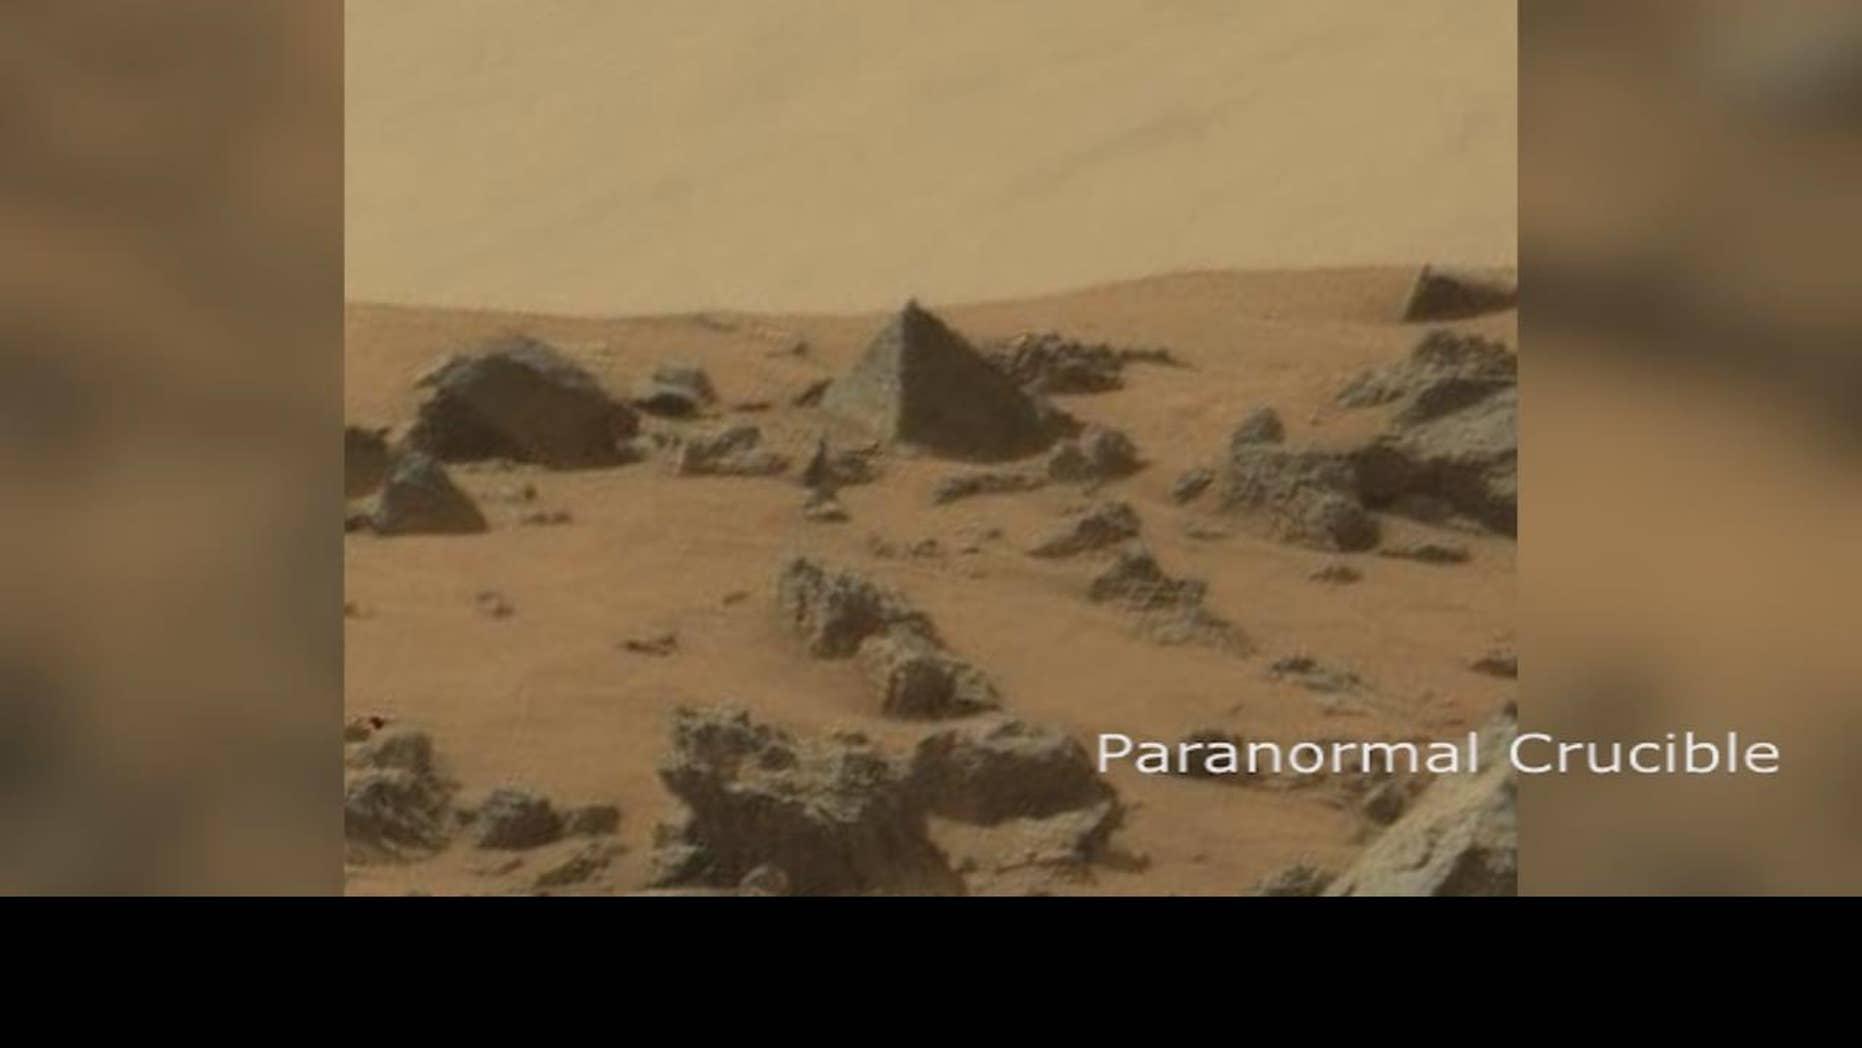 NASA image from Paranormal Crucible YouTube video